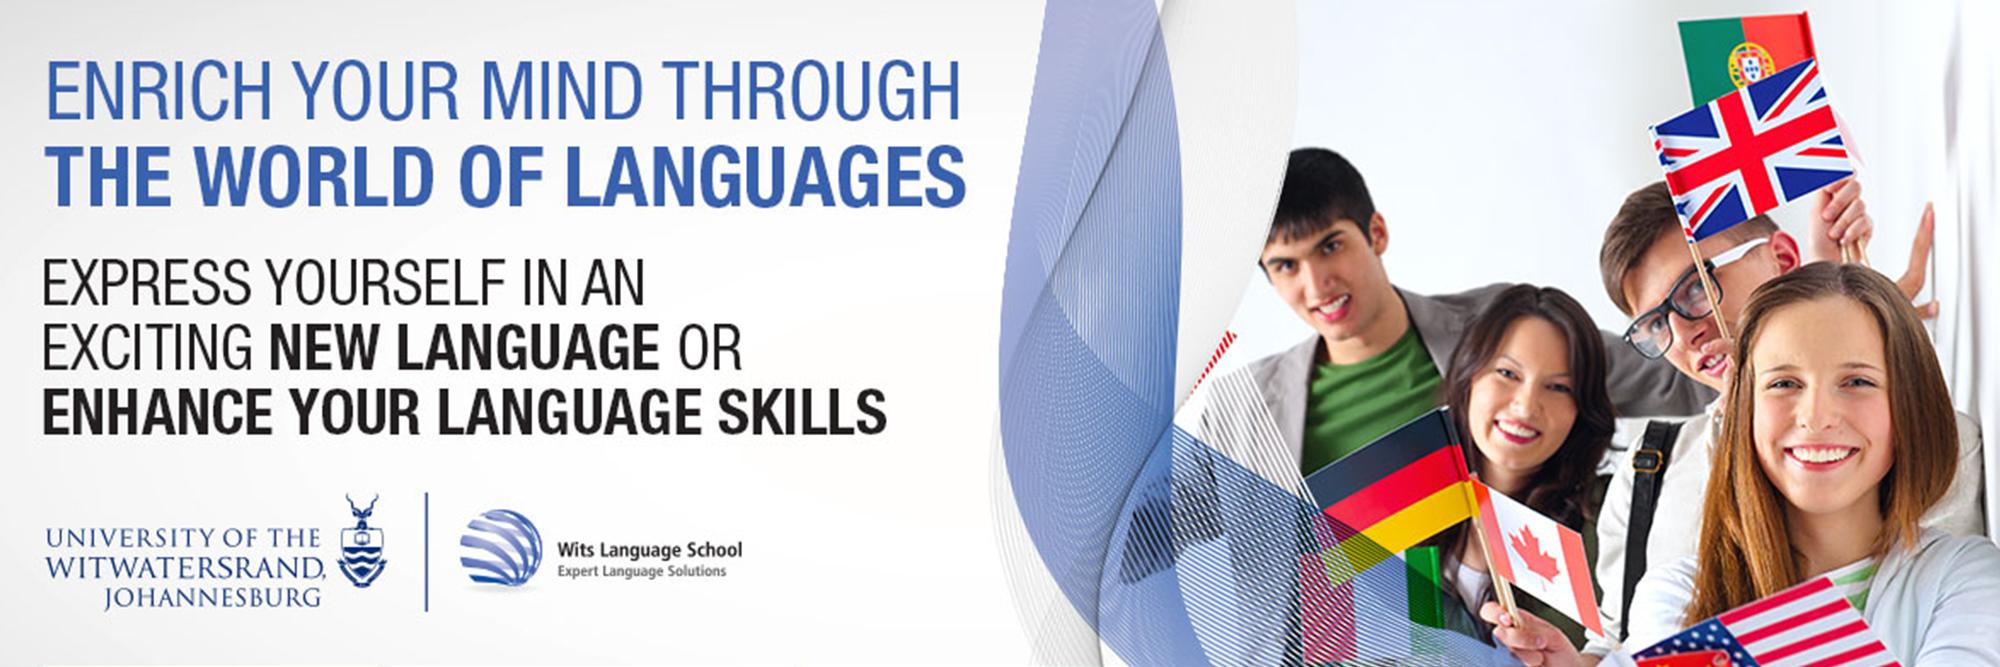 Wits Language School - Wits University